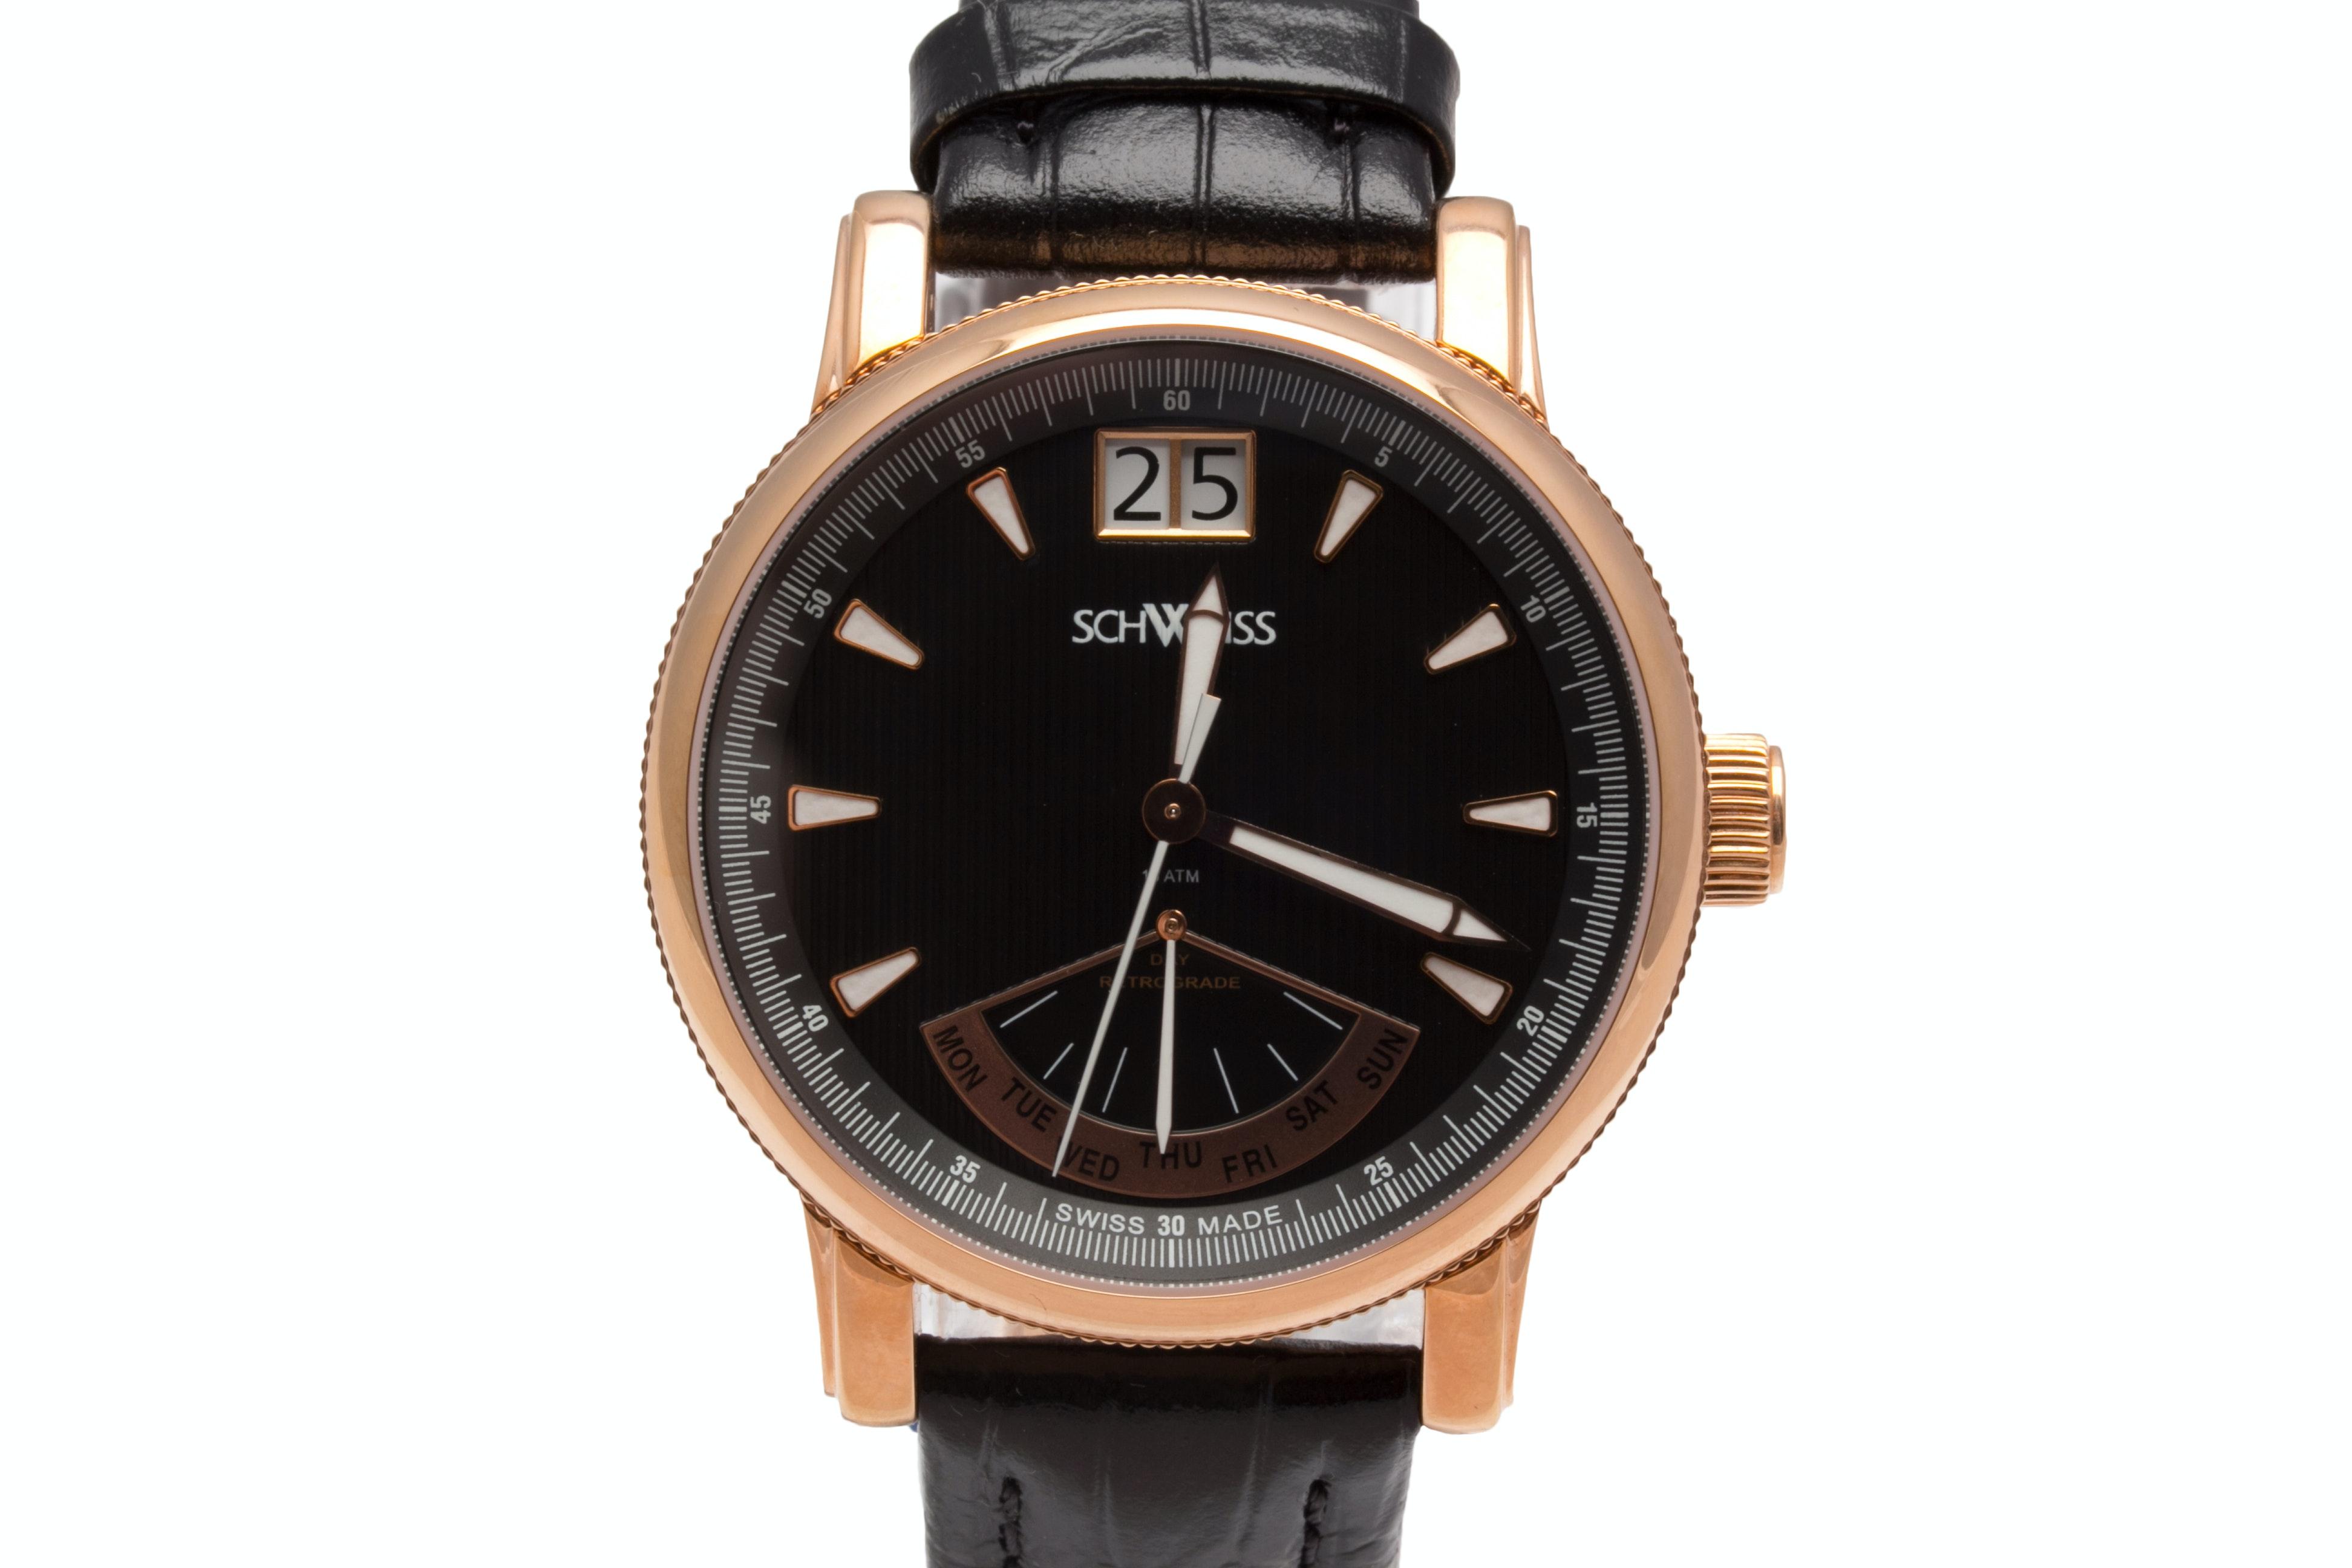 Schweiss Rose Gold Tone Wristwatch